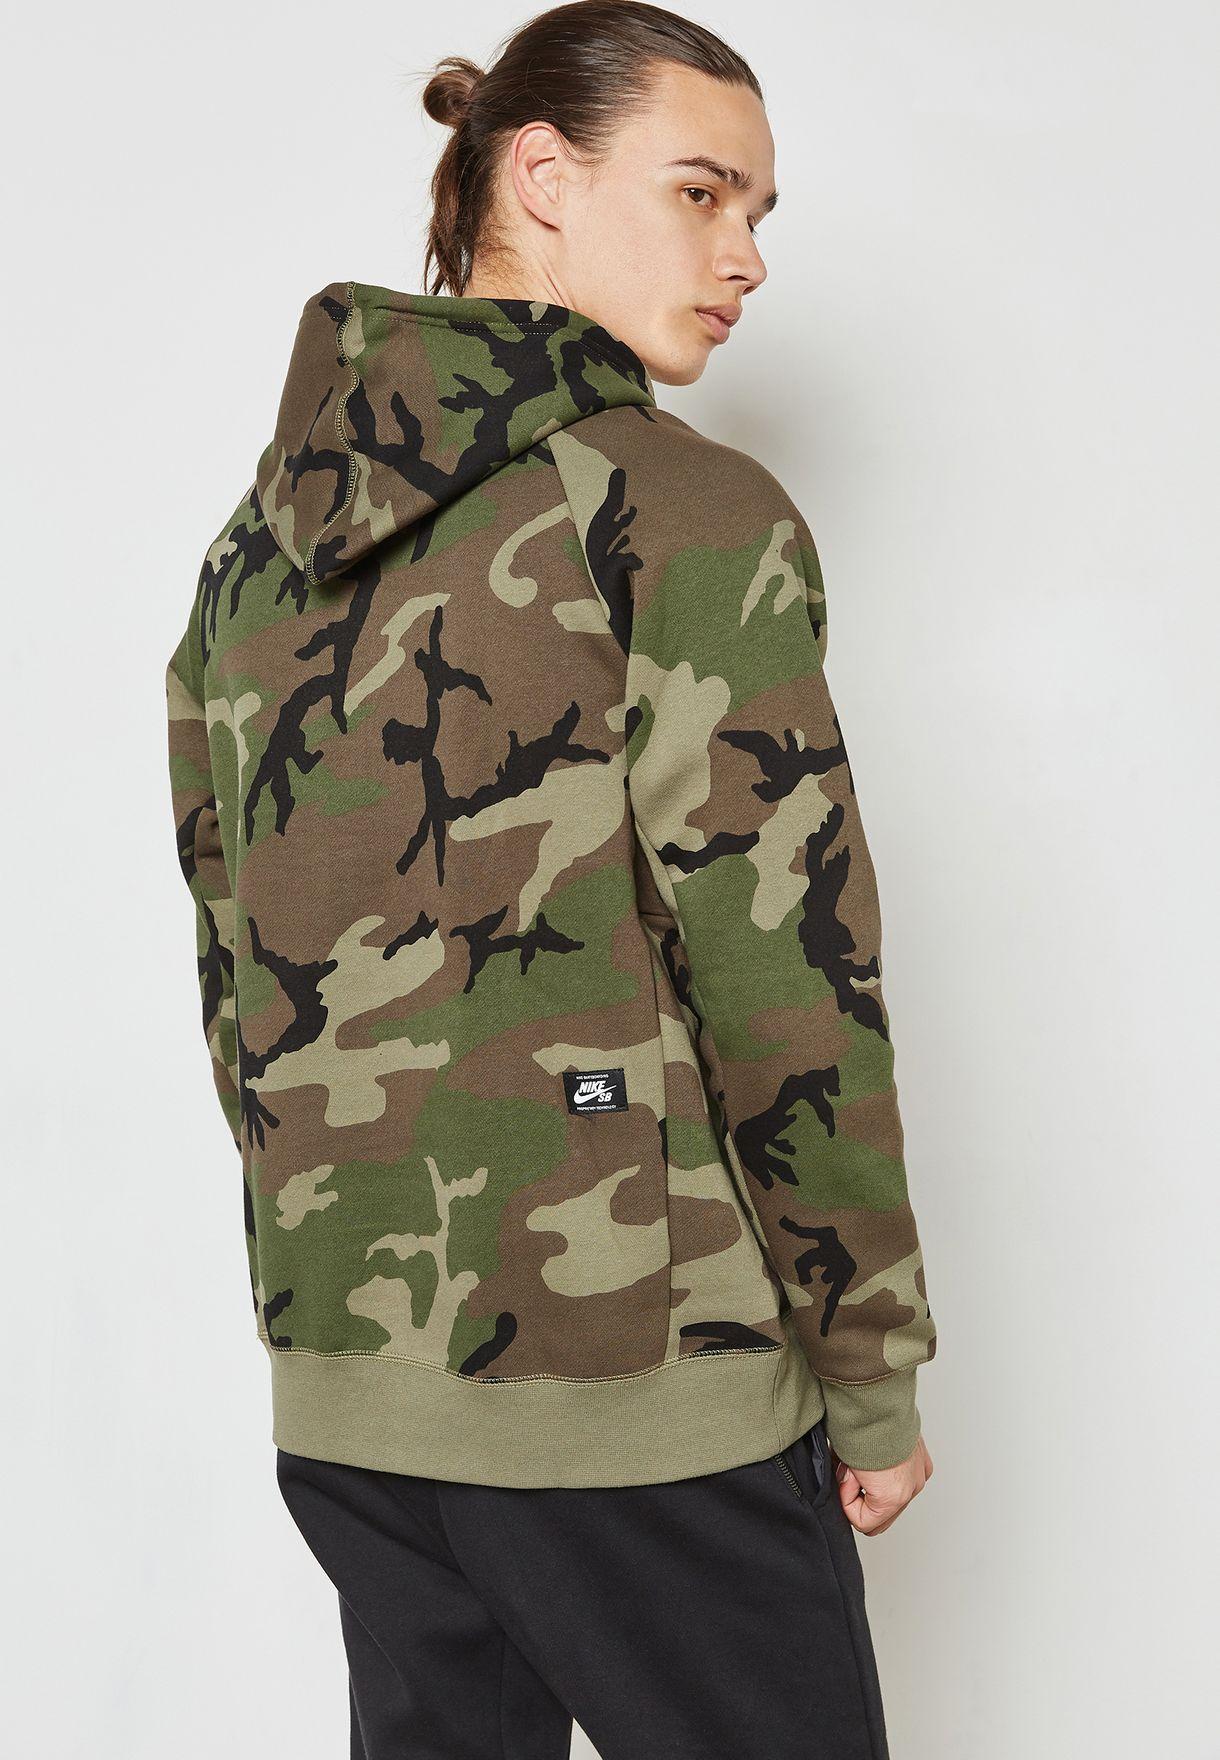 Nike SB AH5514 222 Kapuzenpullover in Grün mit Military